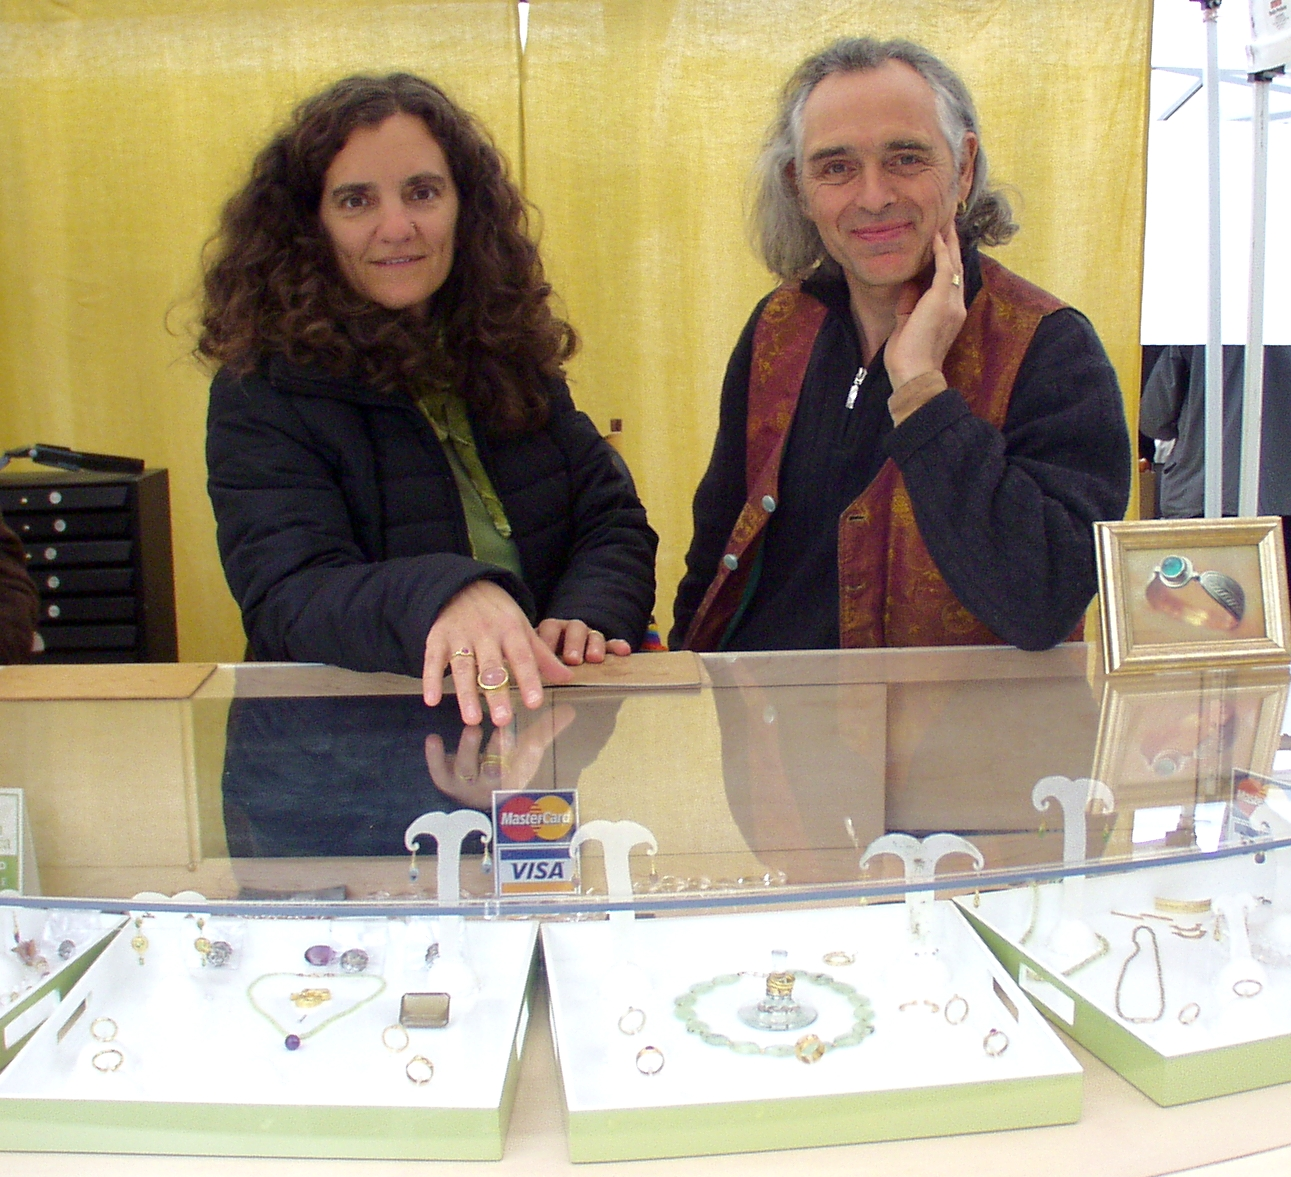 Tom Lambert, right, and Sheryl Morgenstern, of Itali Lambertini jewerly. Photo copyright 2009 by Zachary D. Lyons.